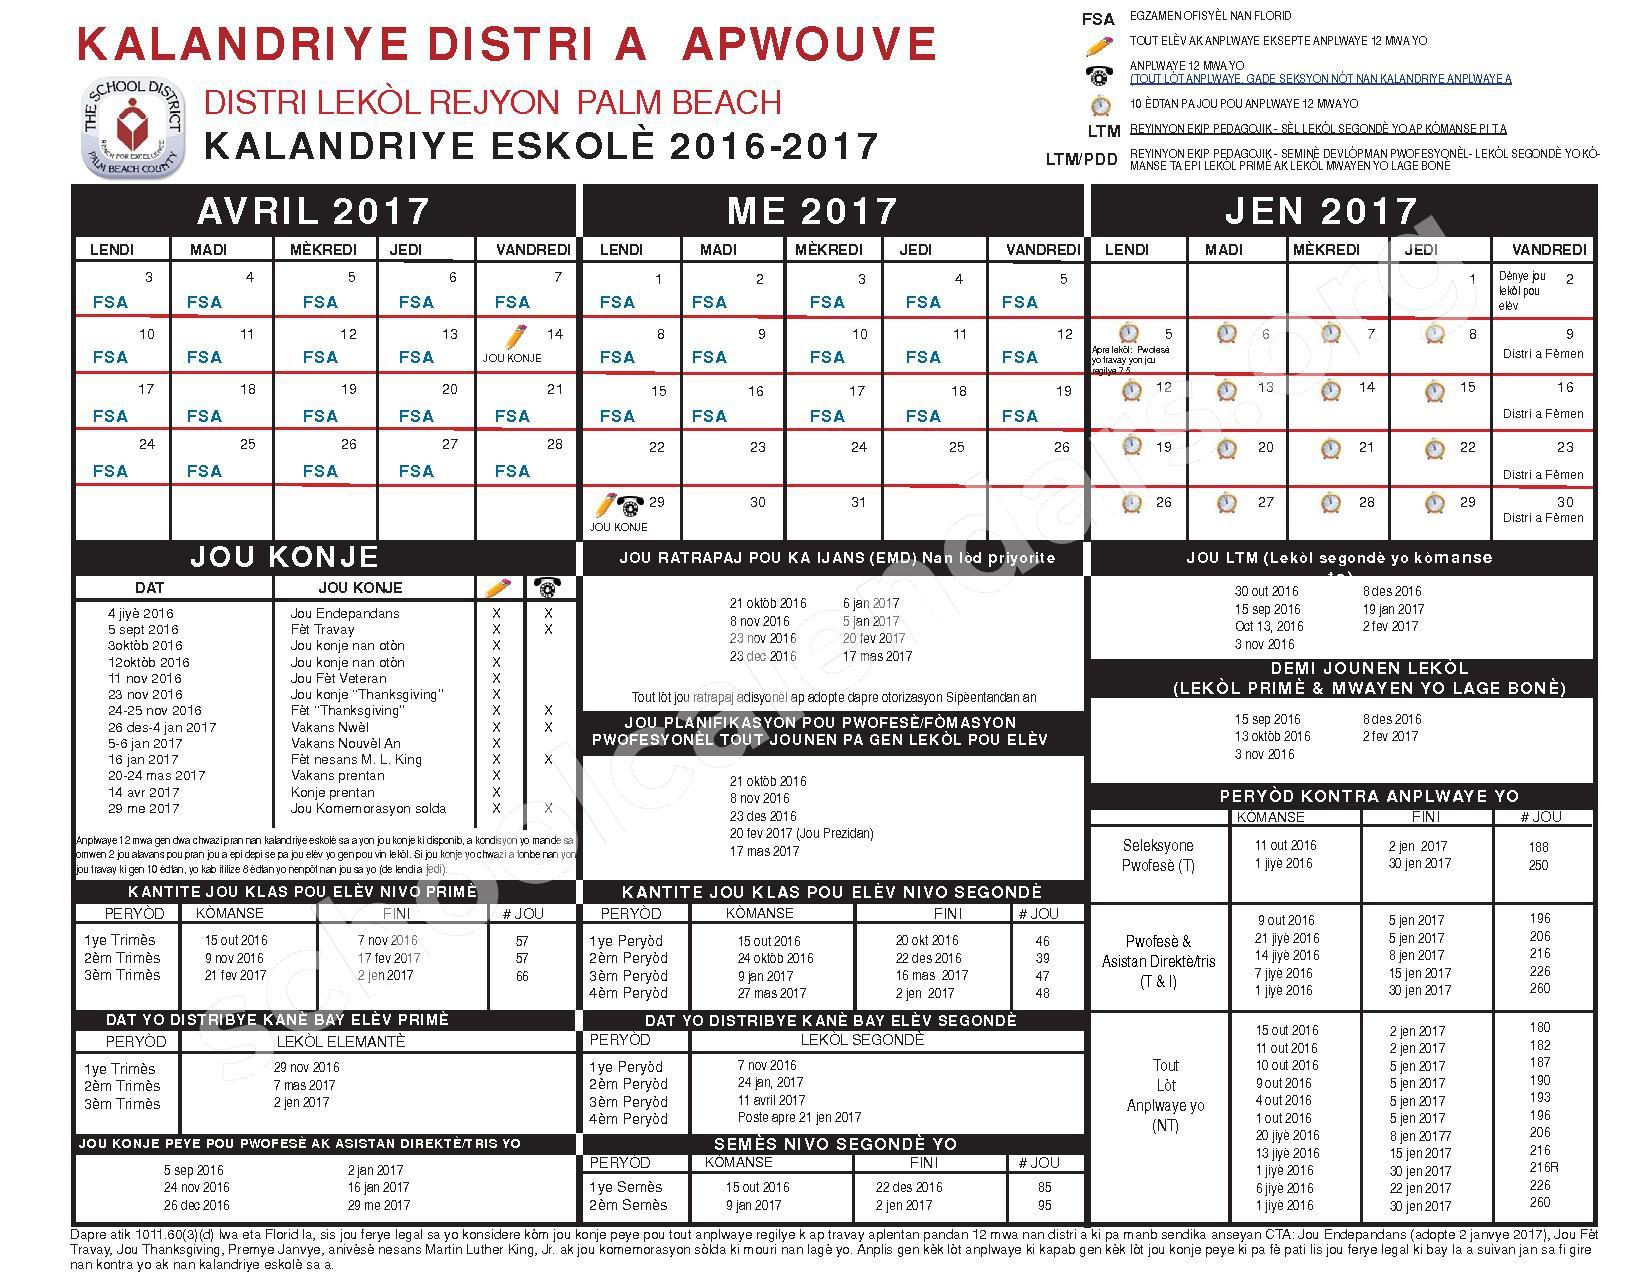 2016 - 2017 KALANDRIYE ESKOLÈ (Creole) – Boynton Beach Community Adult – page 2